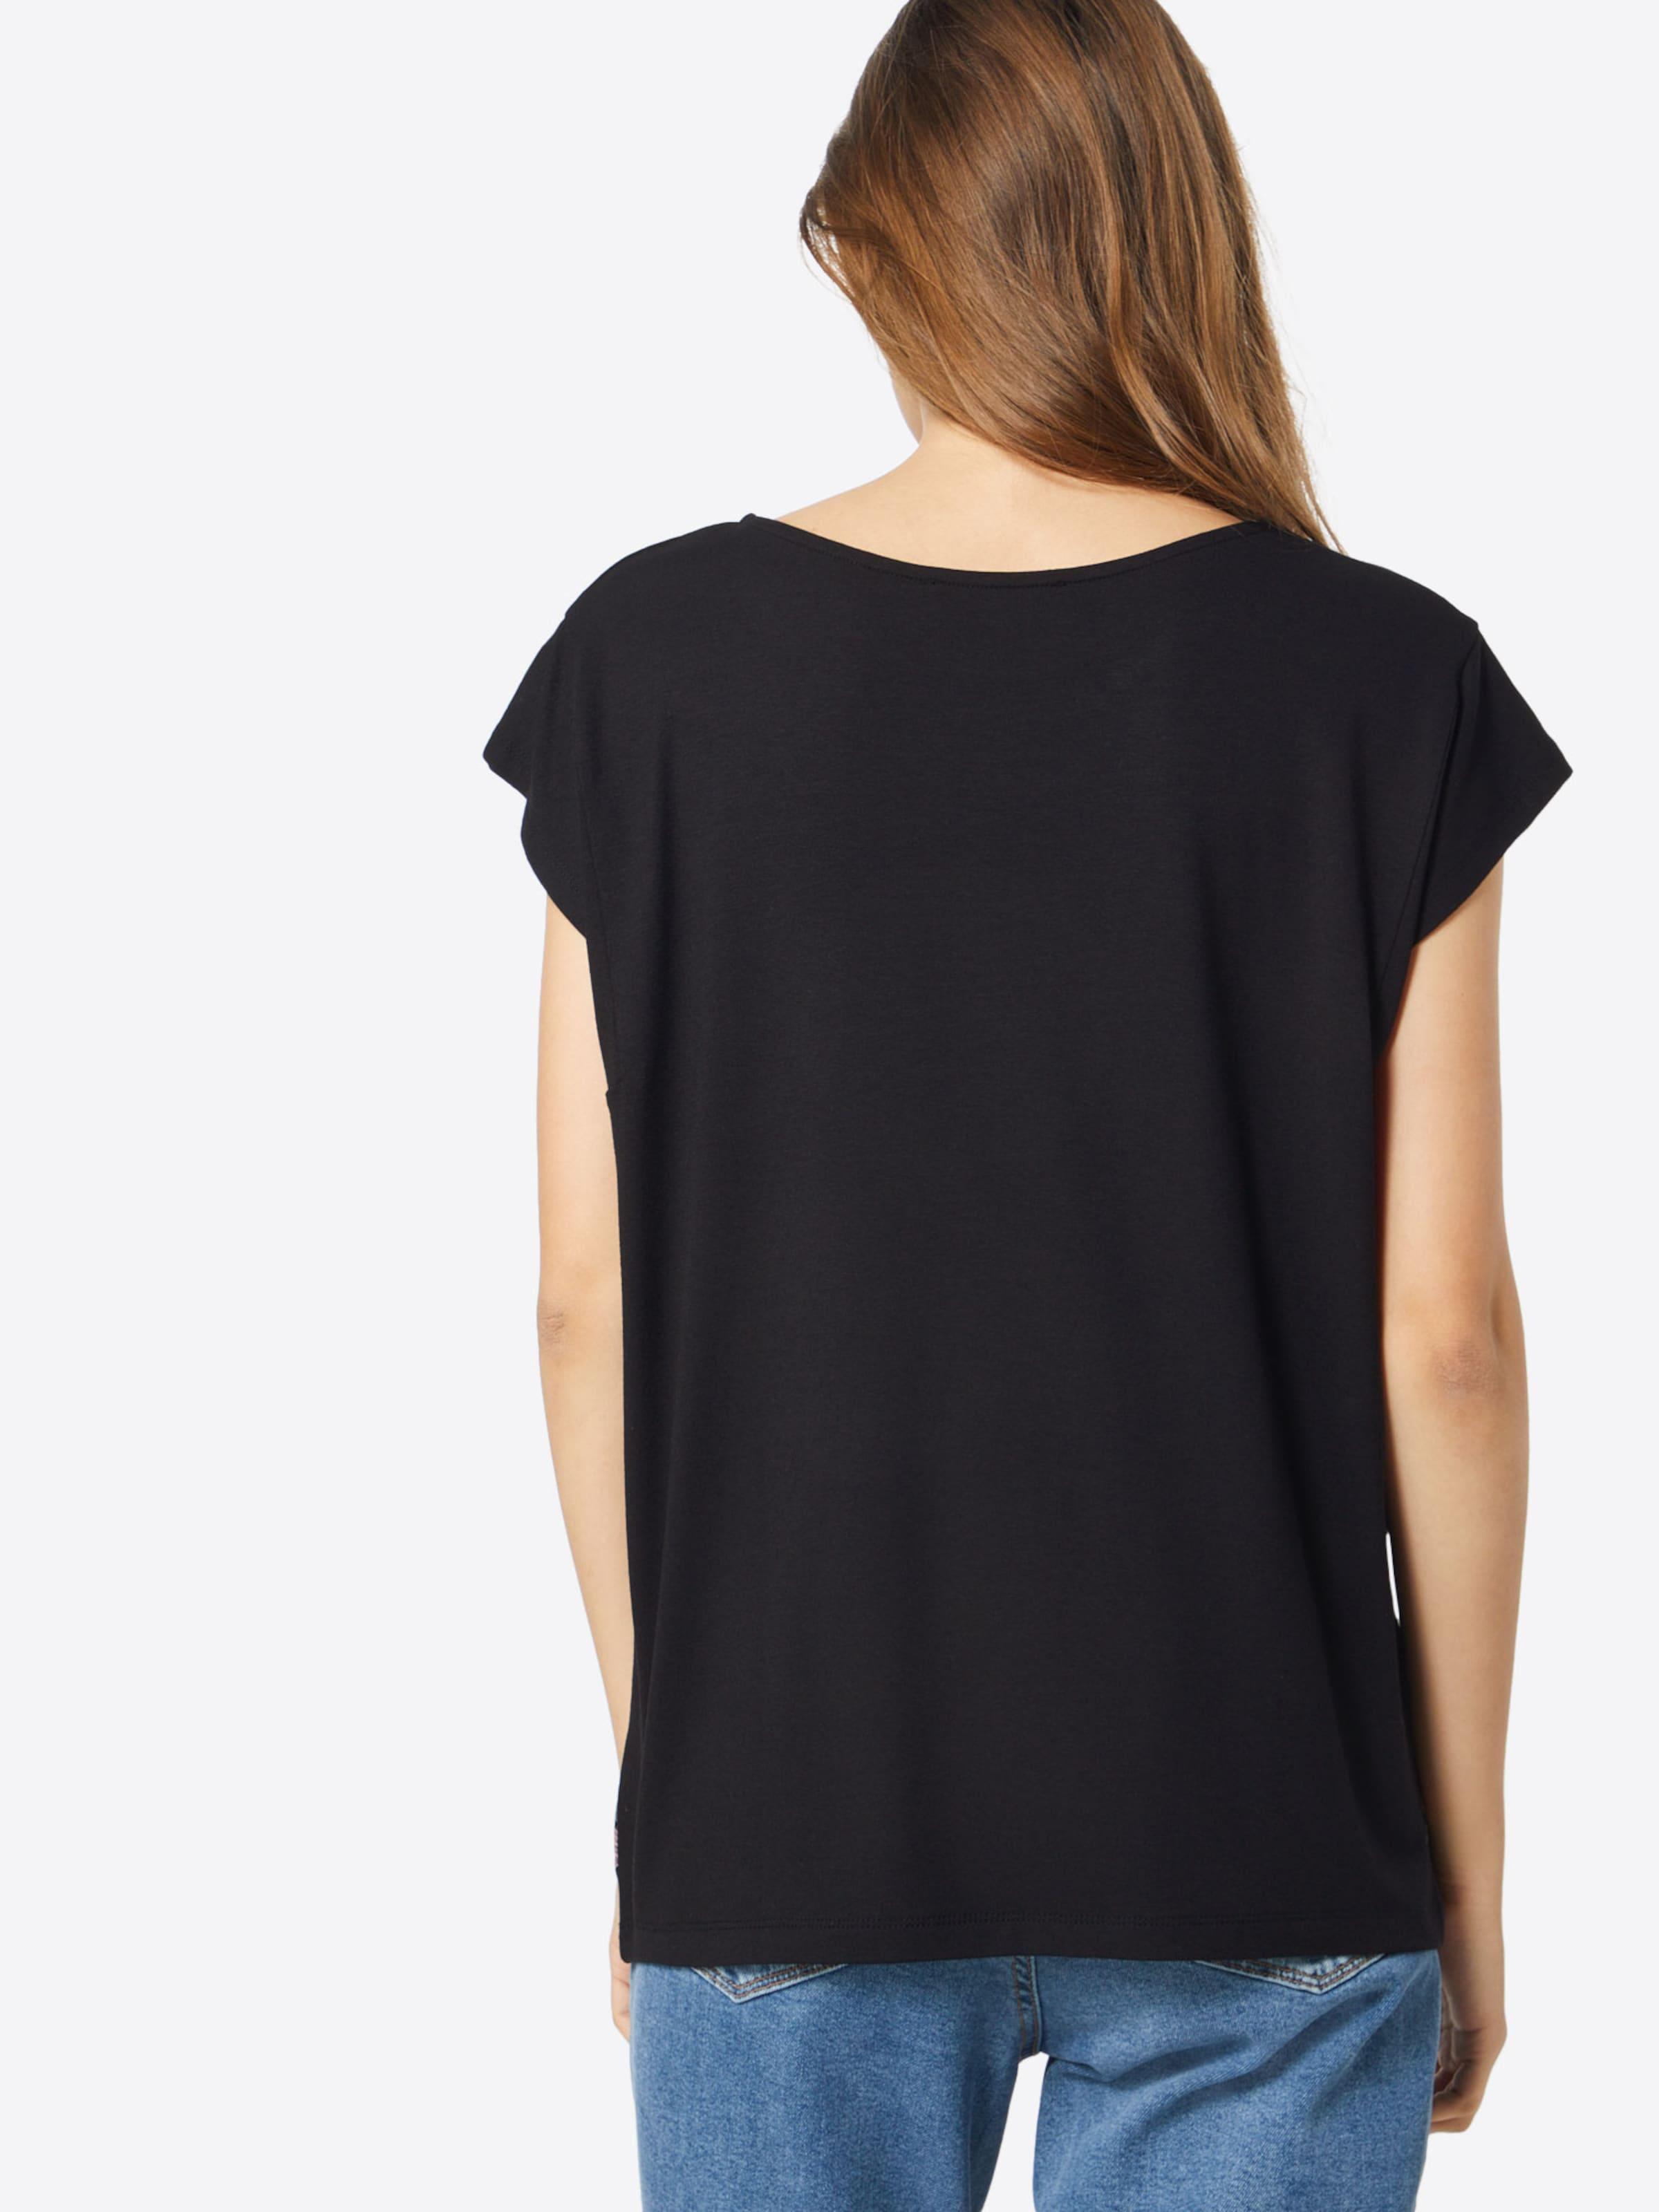 'sabrina' AncienneNoir You About shirt T Rose En WeDIYE9H2